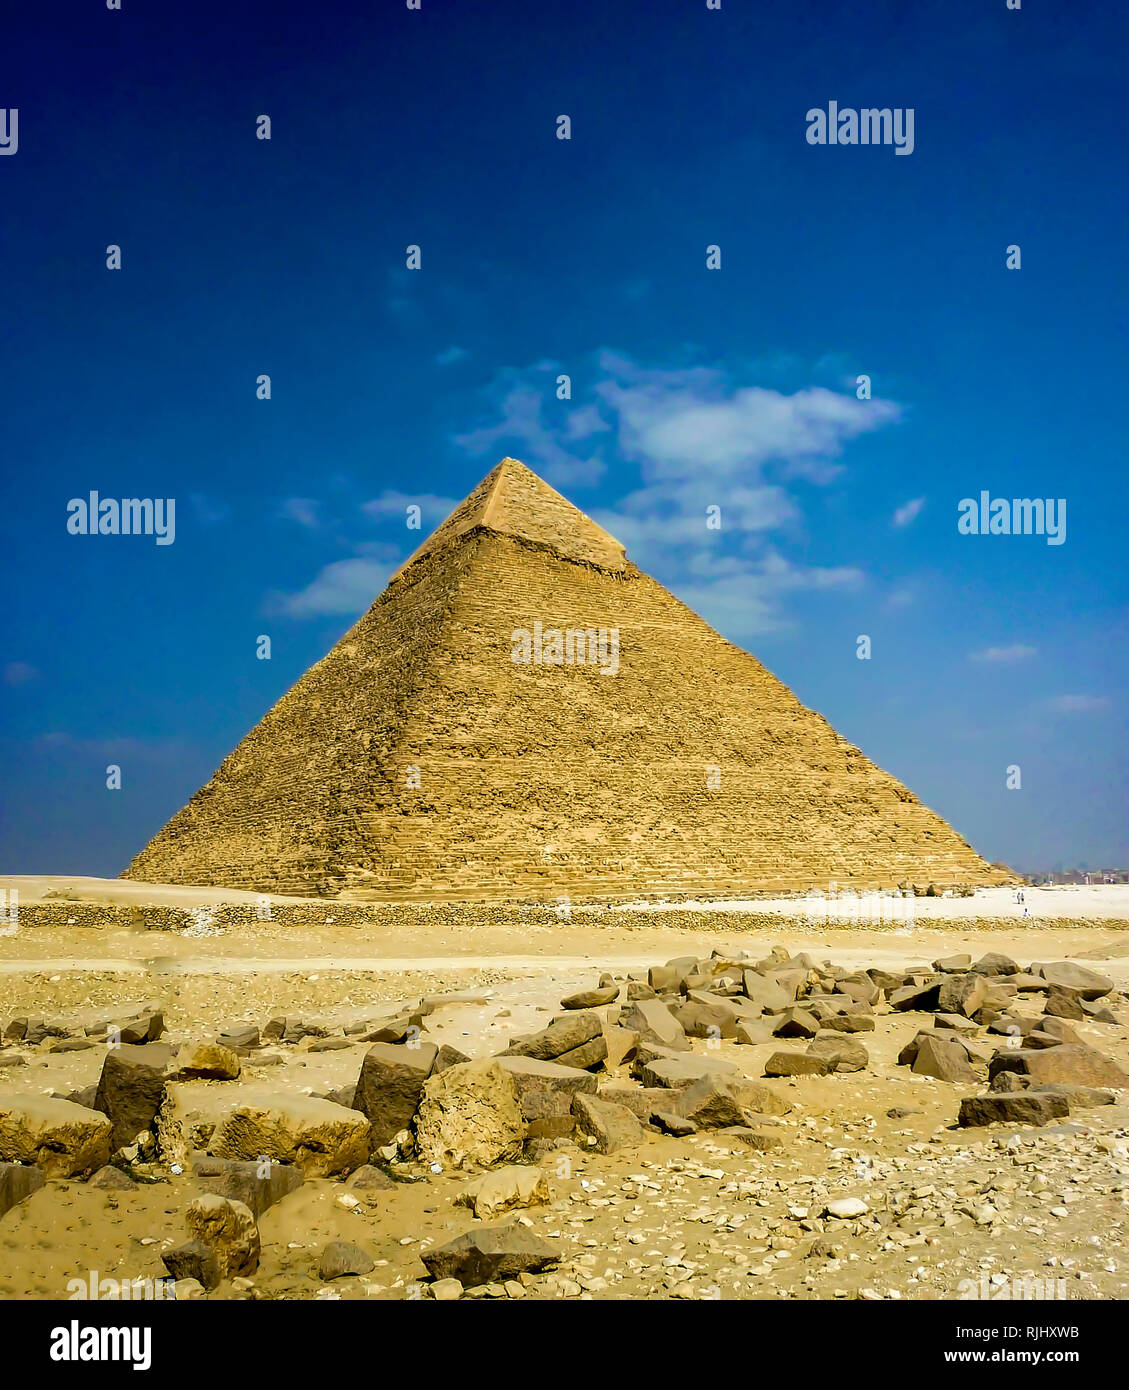 Pyramid of Khafre   Great Pyramid of Giza Great Sphinx of